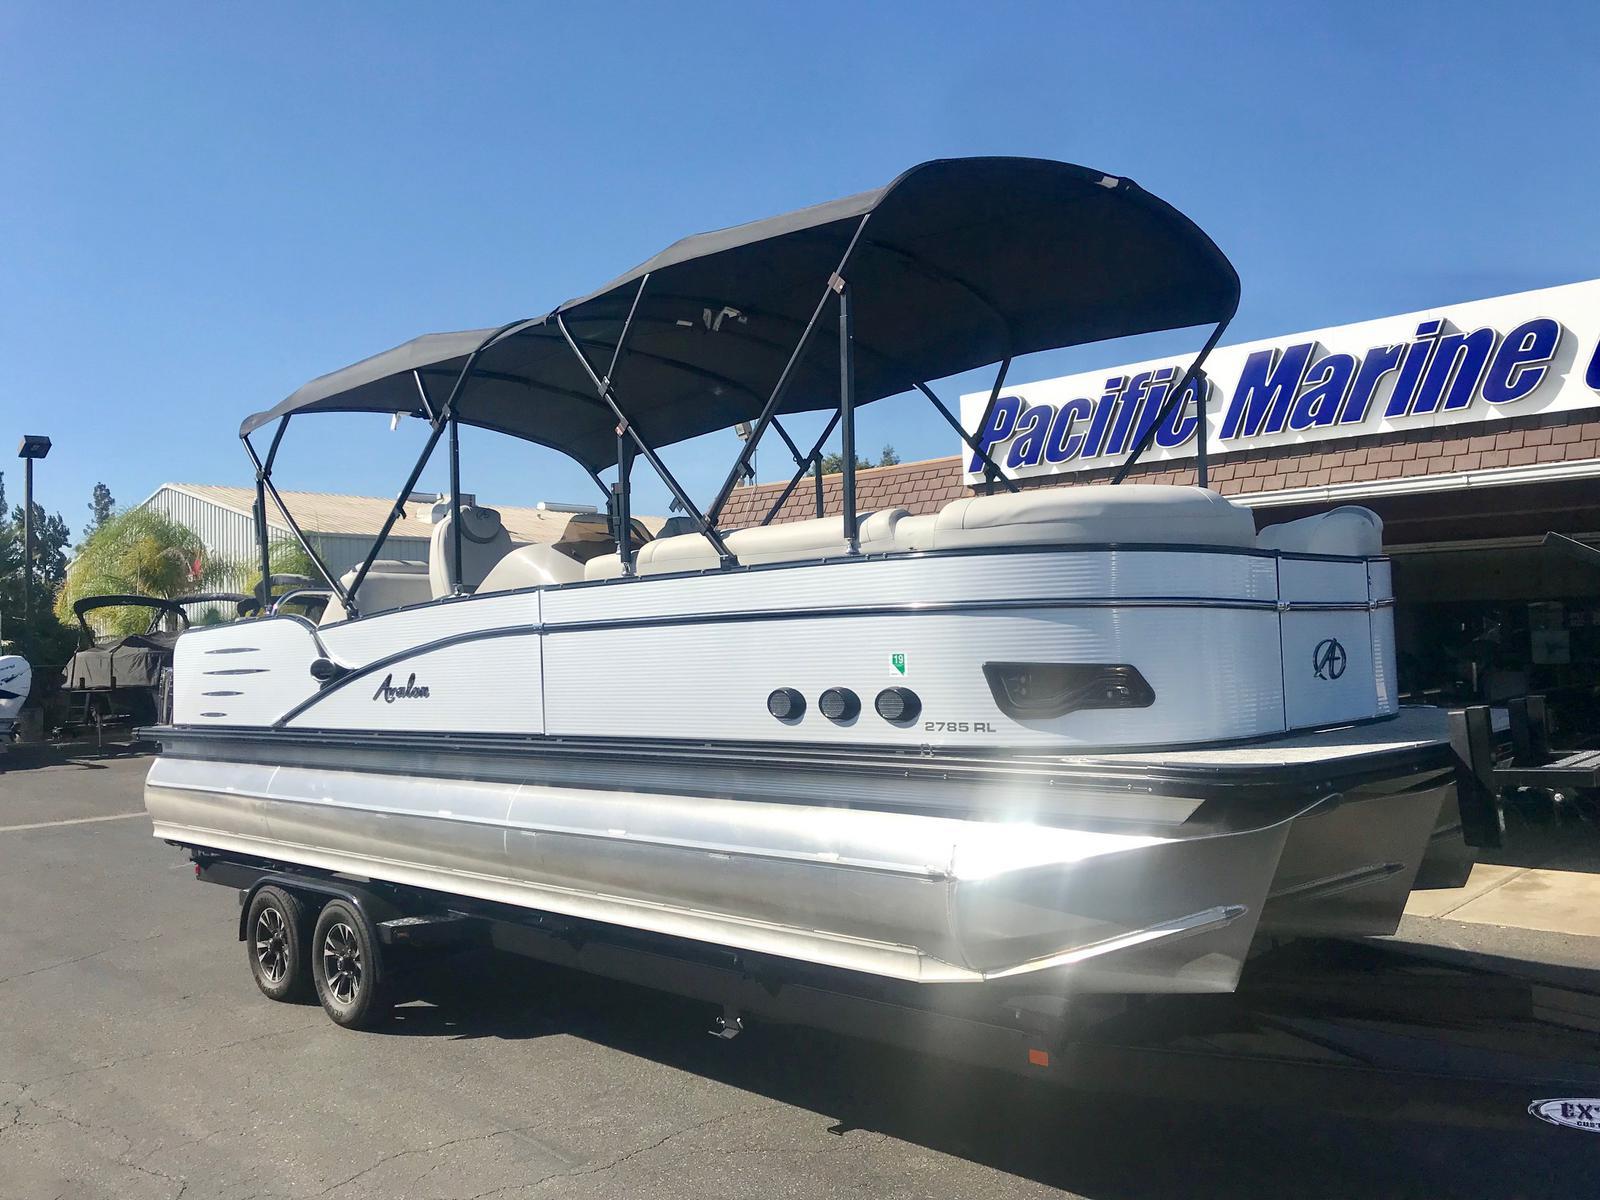 Avalon Catalina Platinum Rear Lounge 27' w/ 300 HP Verado!